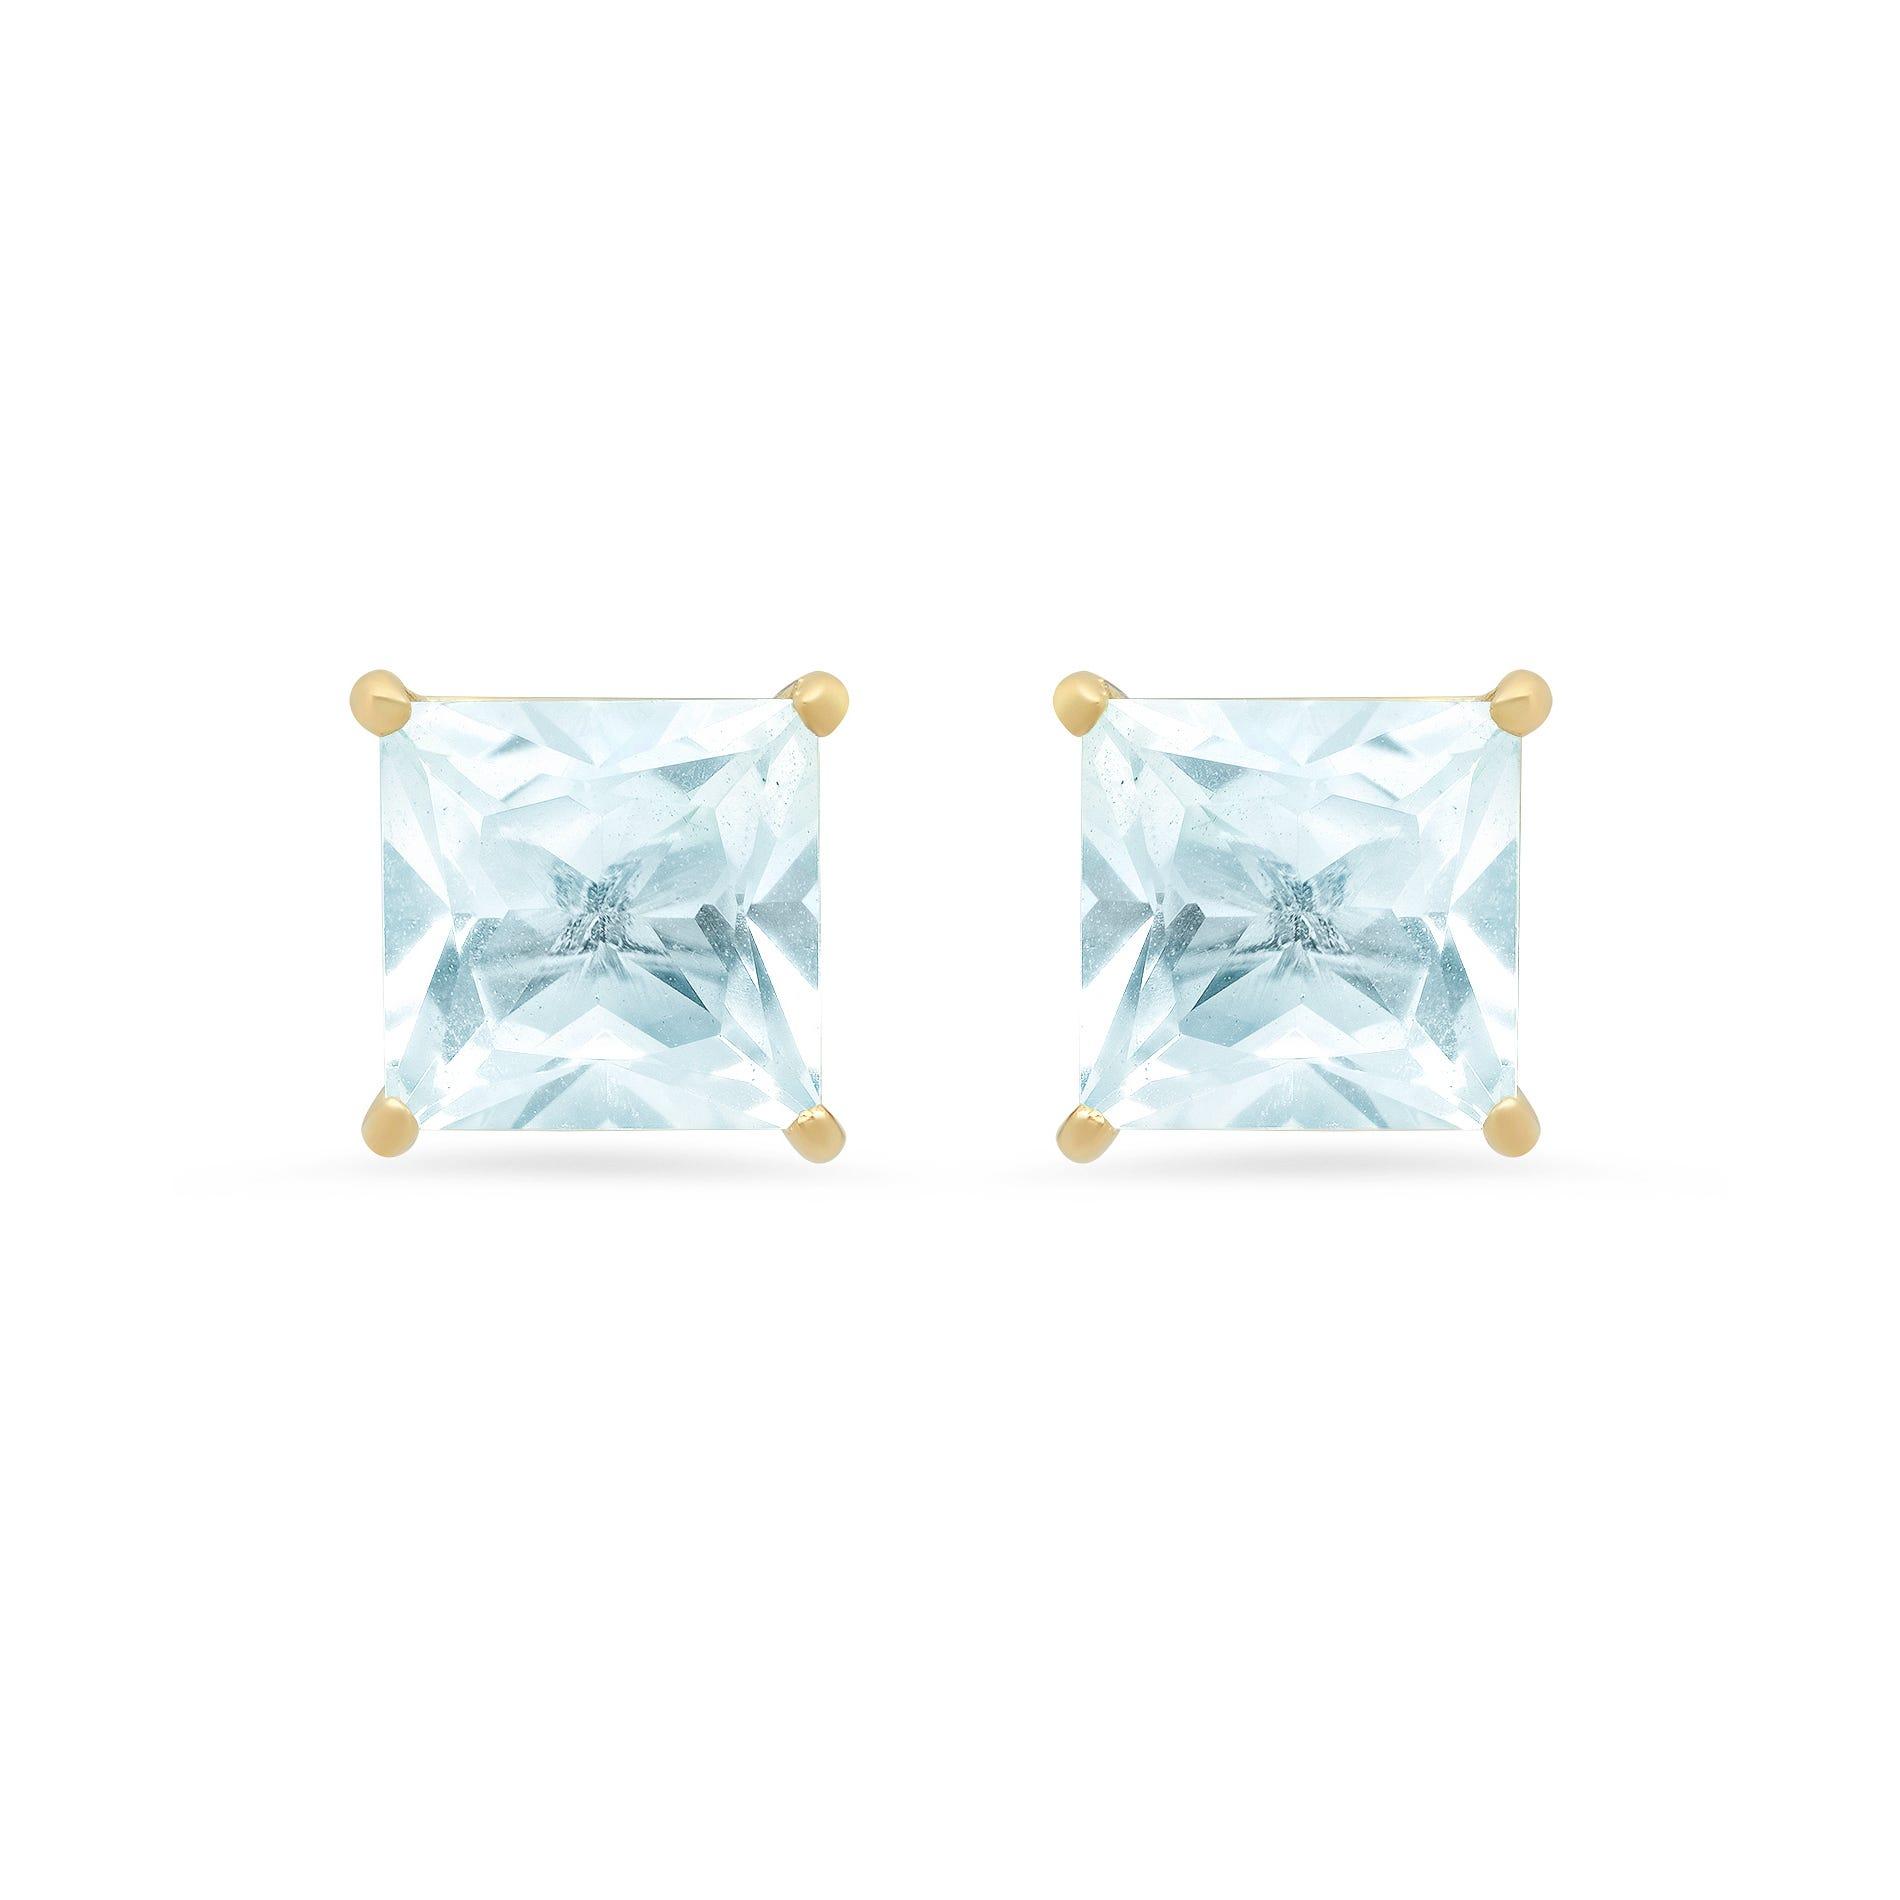 Princess-Cut Aquamarine Solitaire Stud Earrings in 14k Yellow Gold